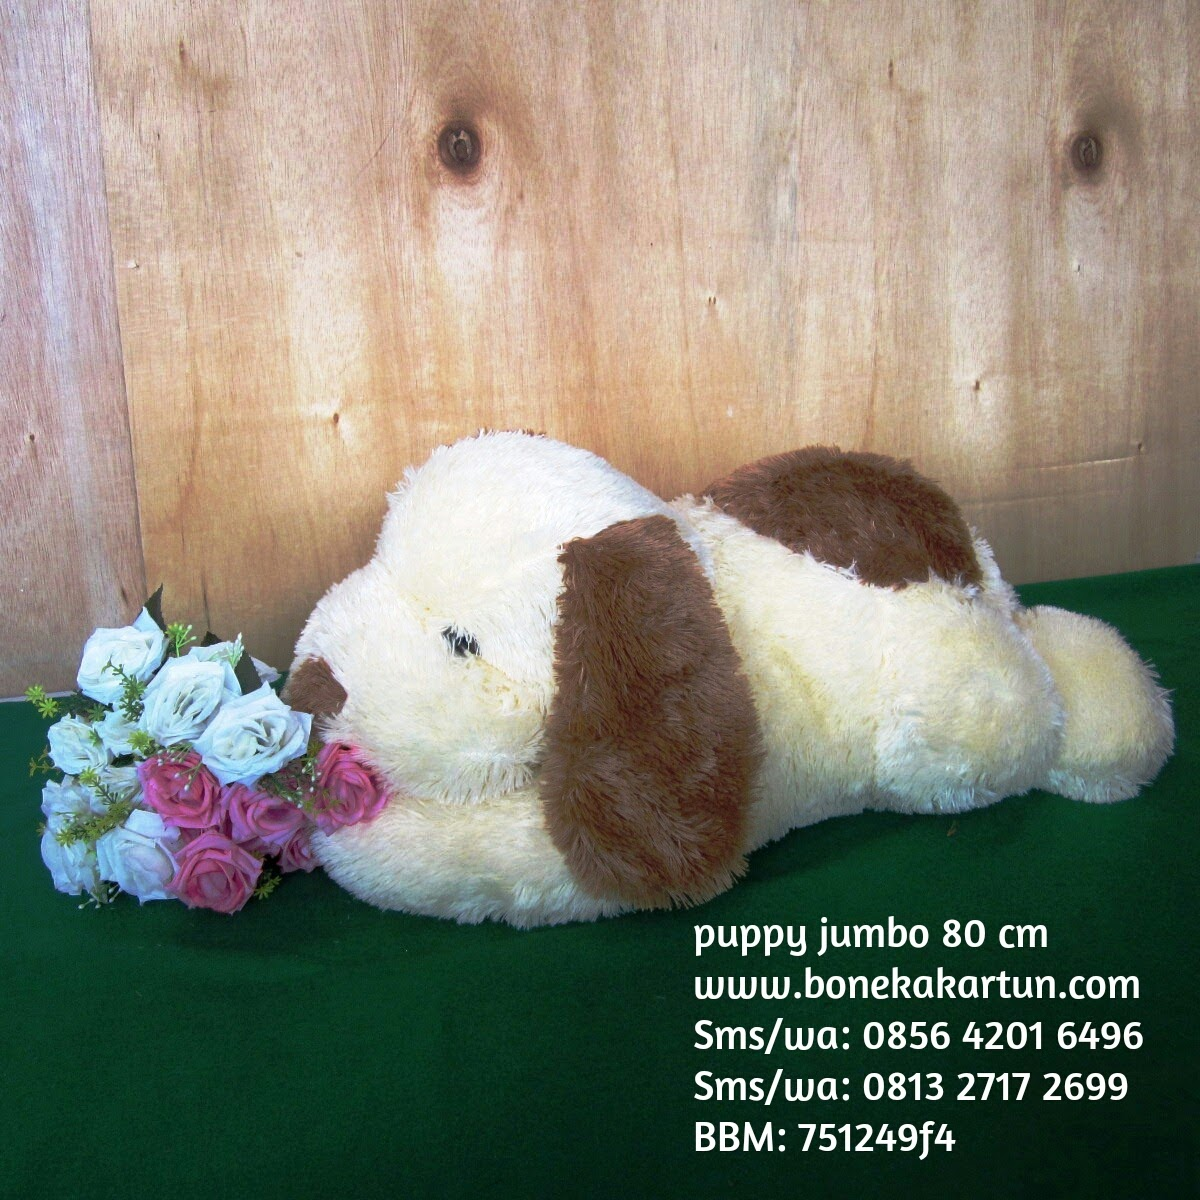 Toko Boneka Lucu Online Jual Harga Murah Panda Beruang Bear Hello Kitty Doraemon Keroppi Besar Oktober 2015